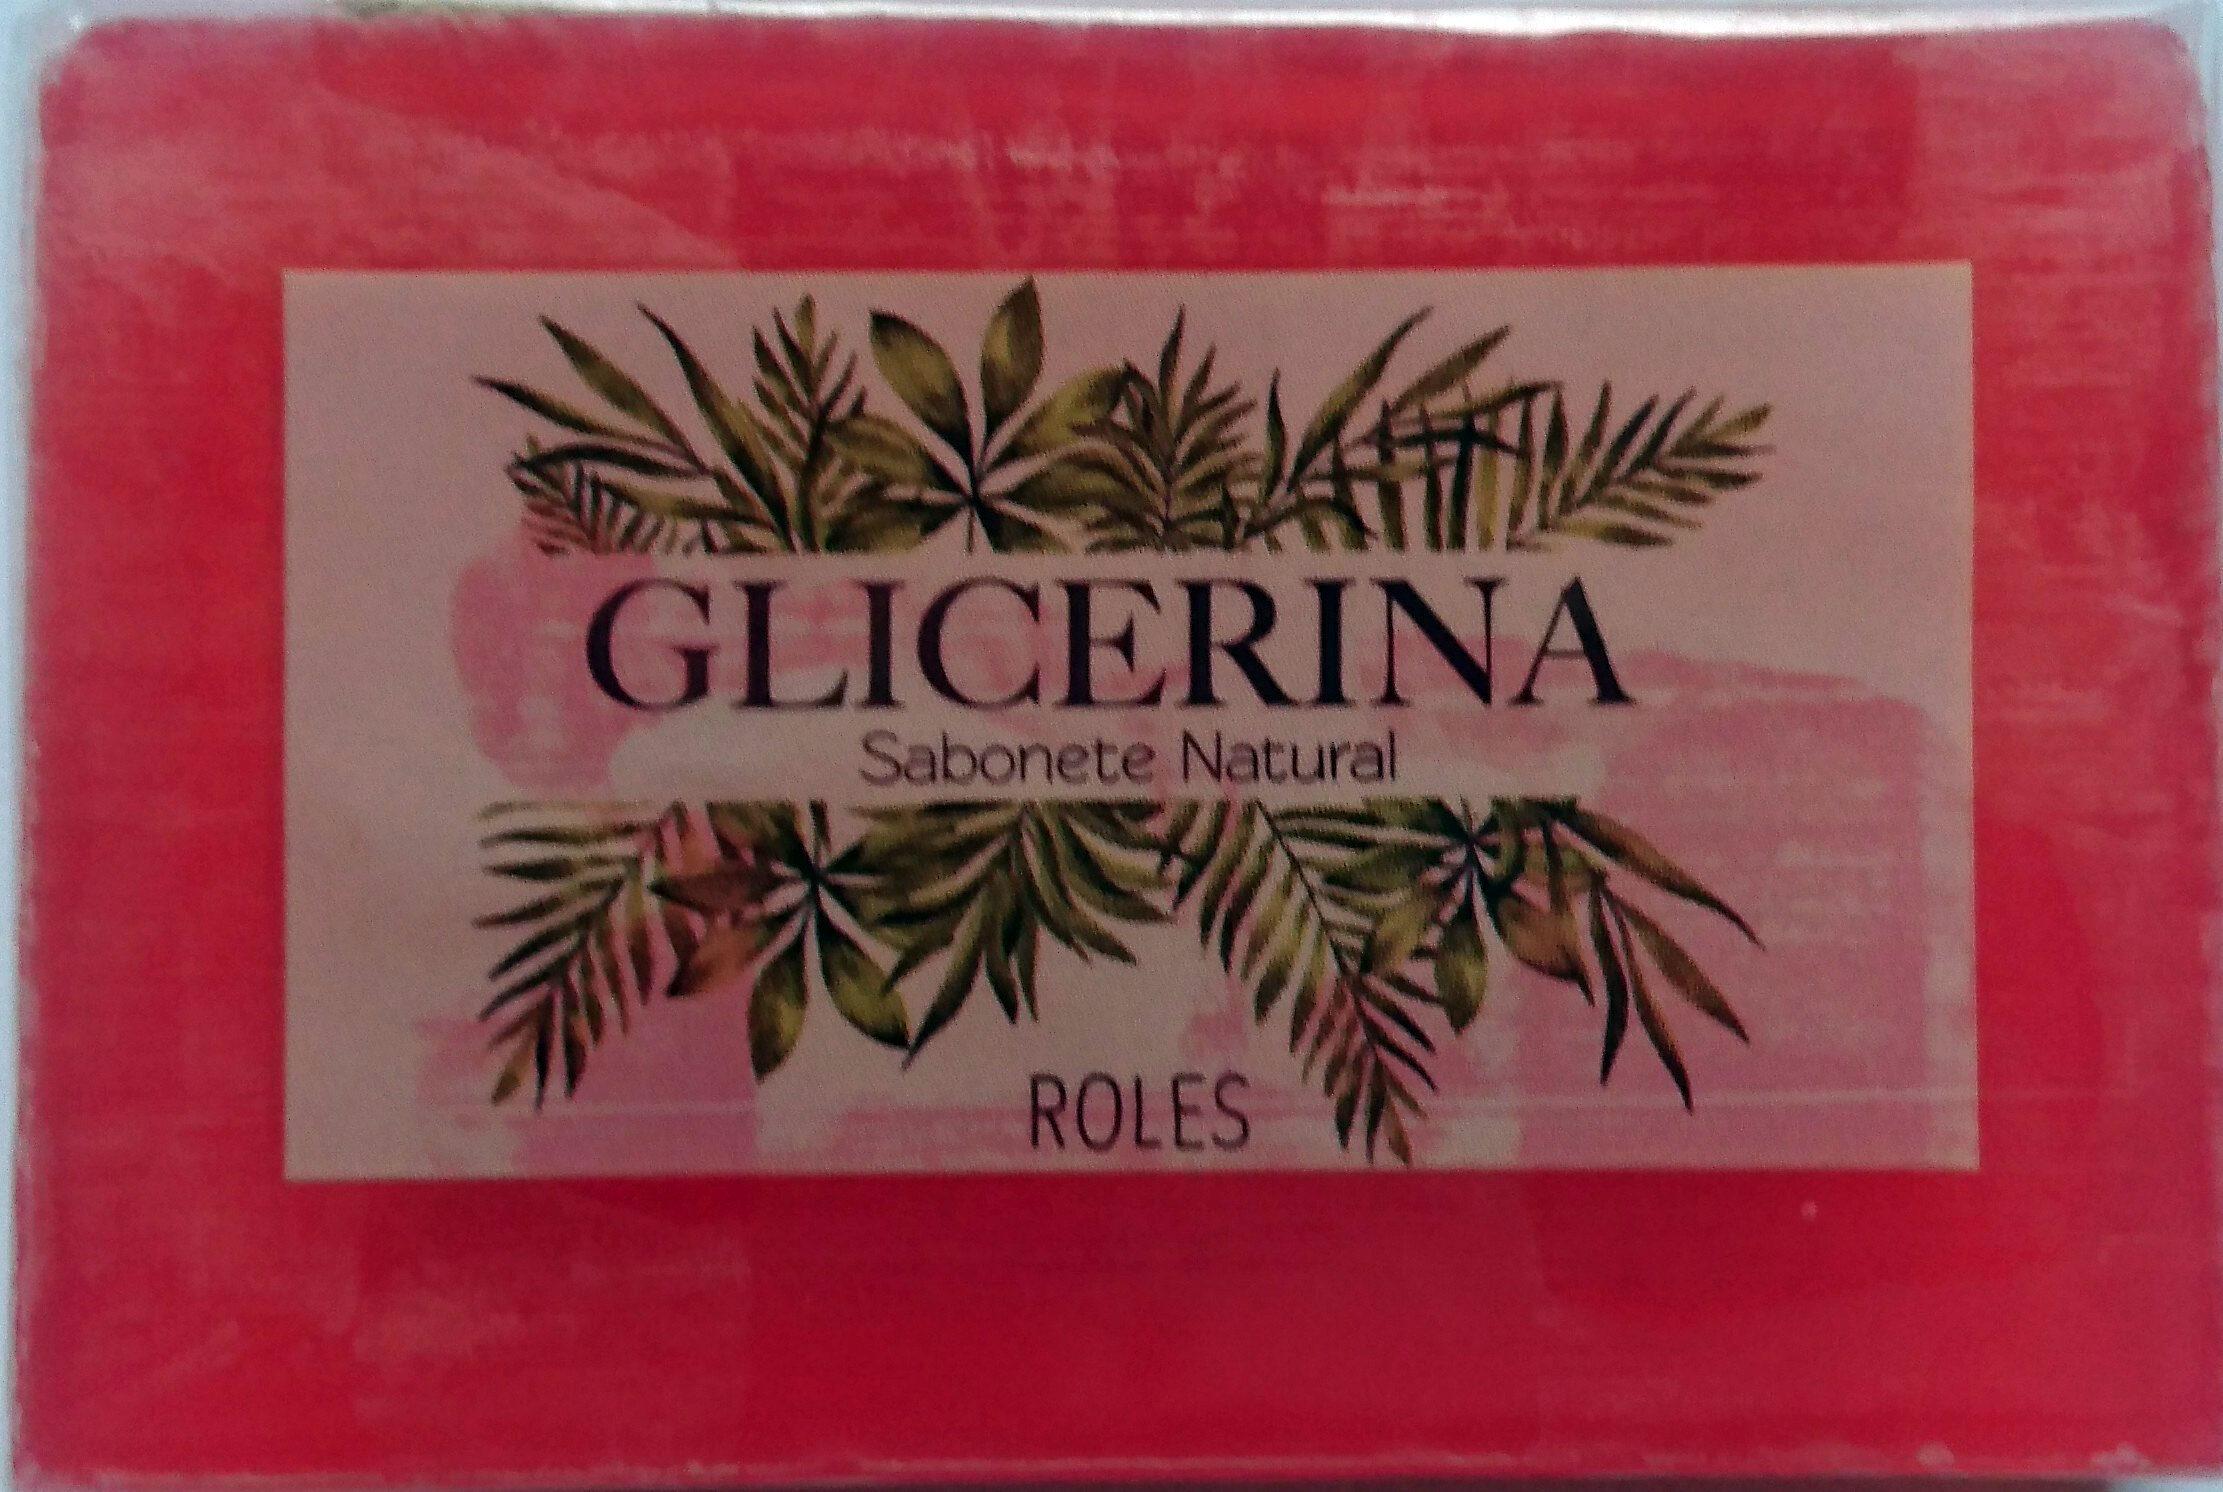 Glicerina Sabonete Natural - Produit - pt